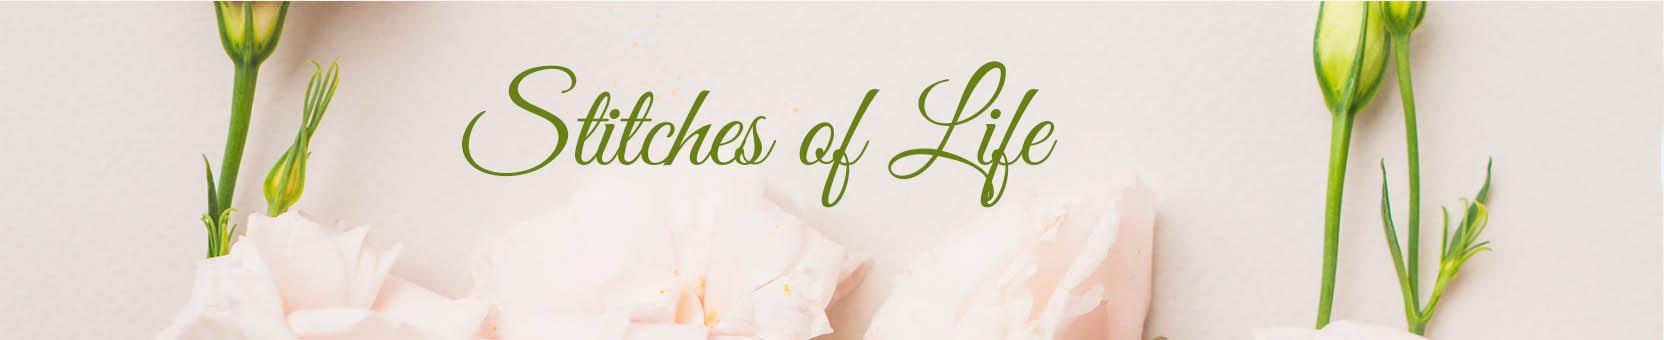 'Stitches of Life'